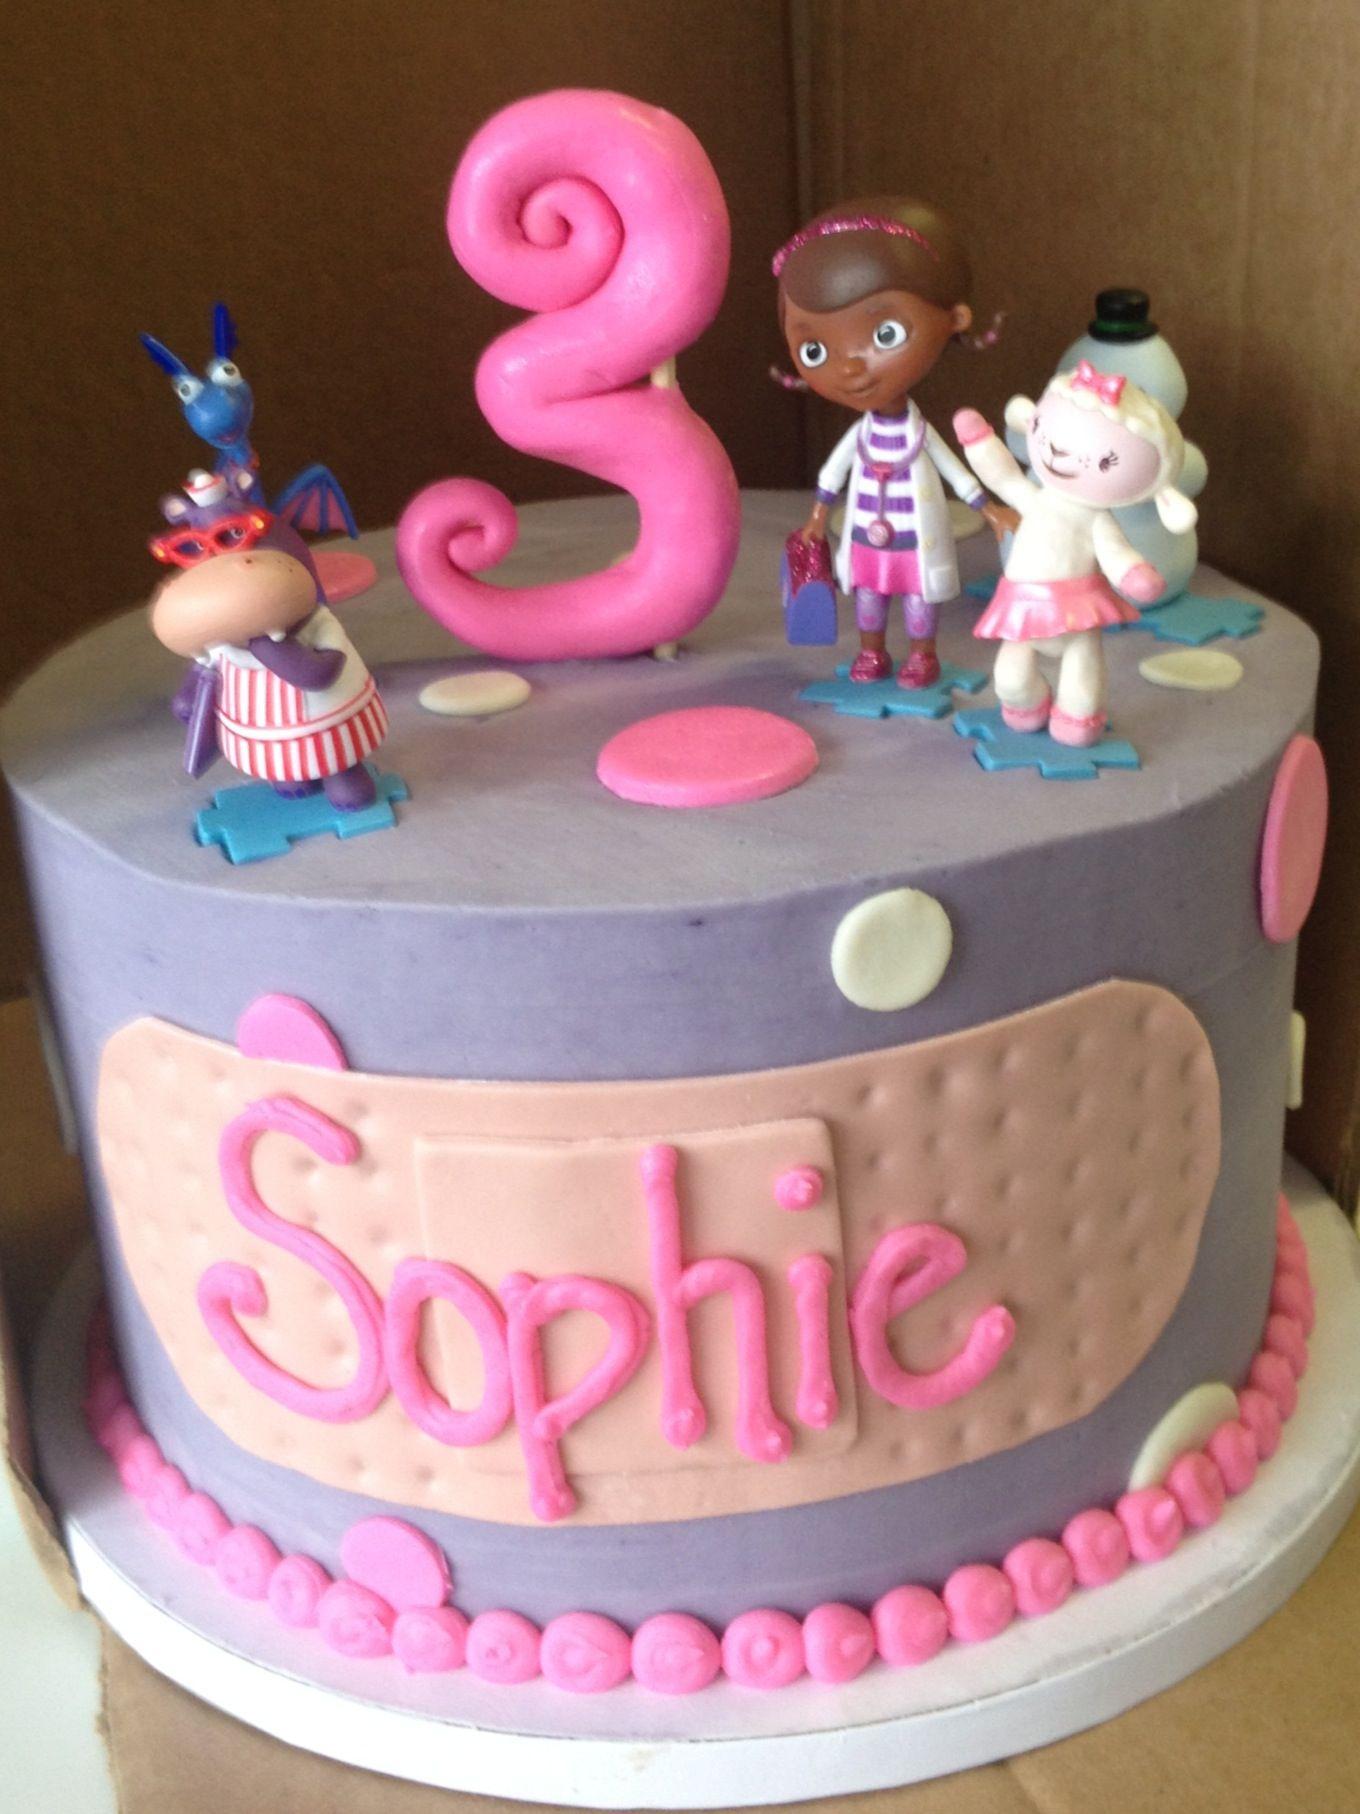 Doc mcstuffins bandages doc mcstuffins party ideas on pinterest doc - Doc Mcstuffins Cake For My Daughter S 3rd Birthday Super Cute